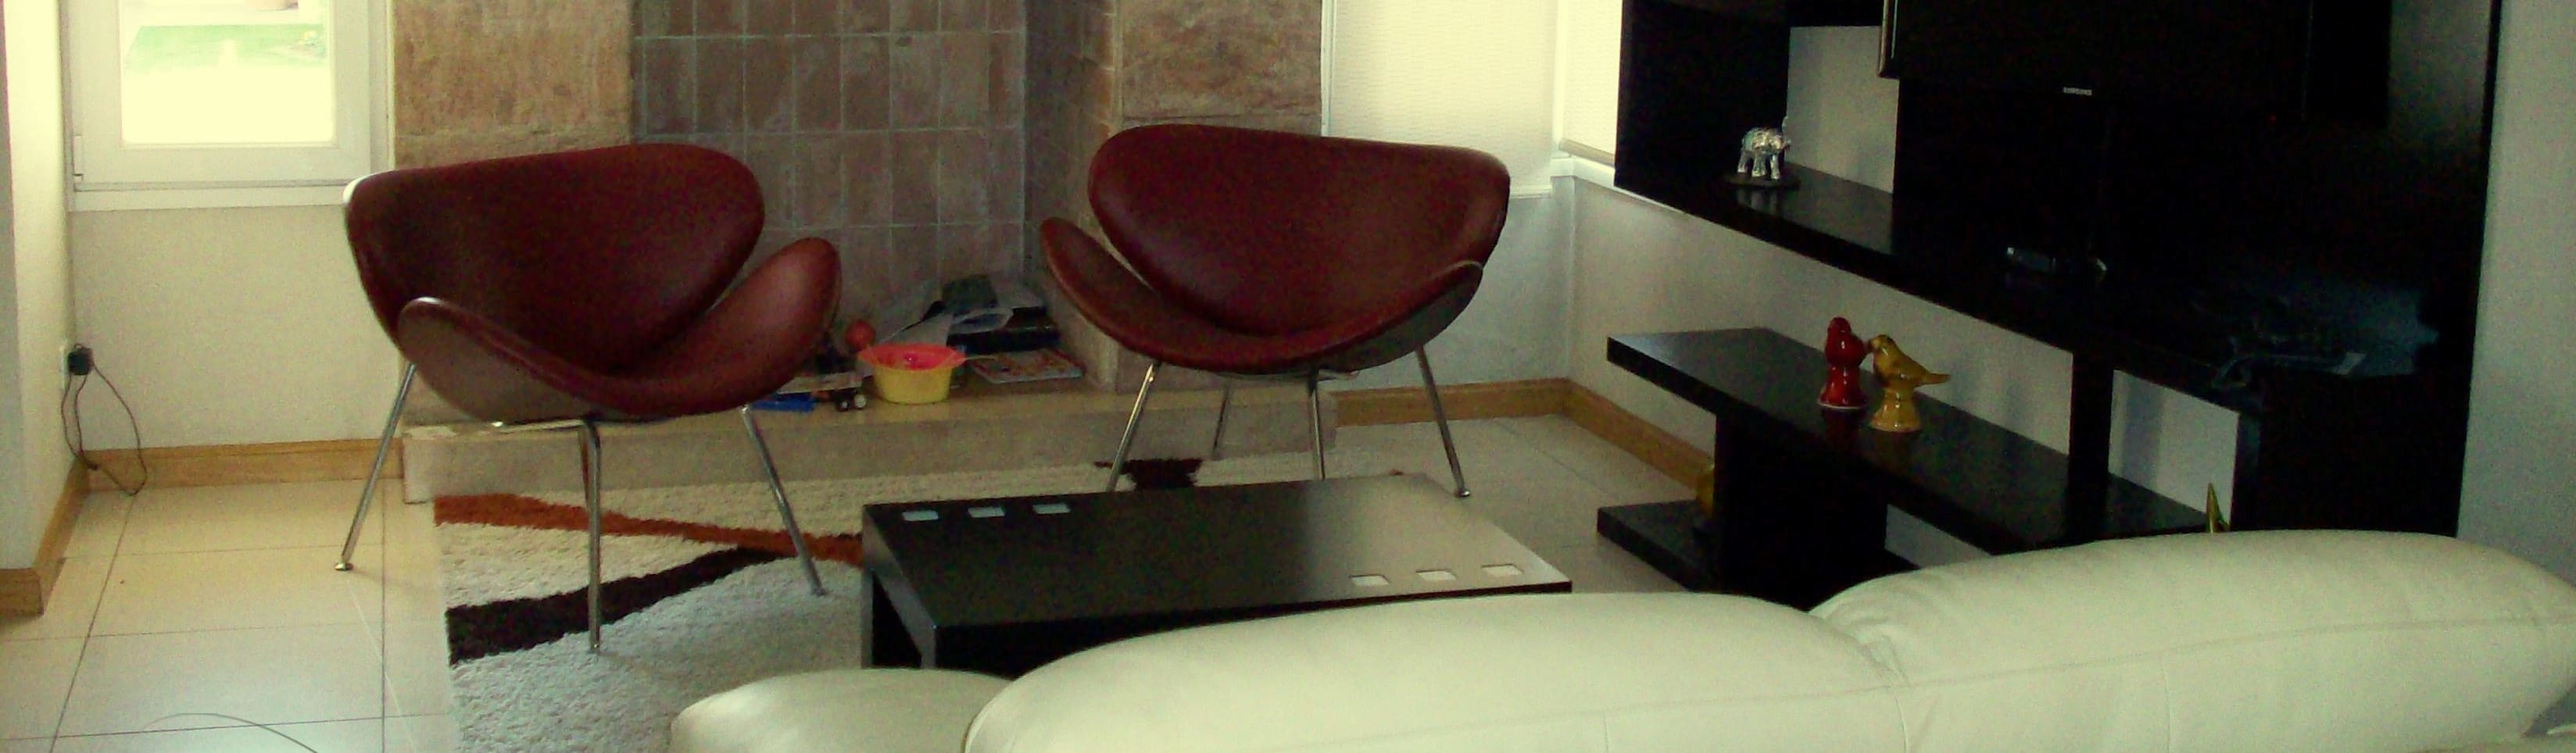 Arq-Diseño Interior